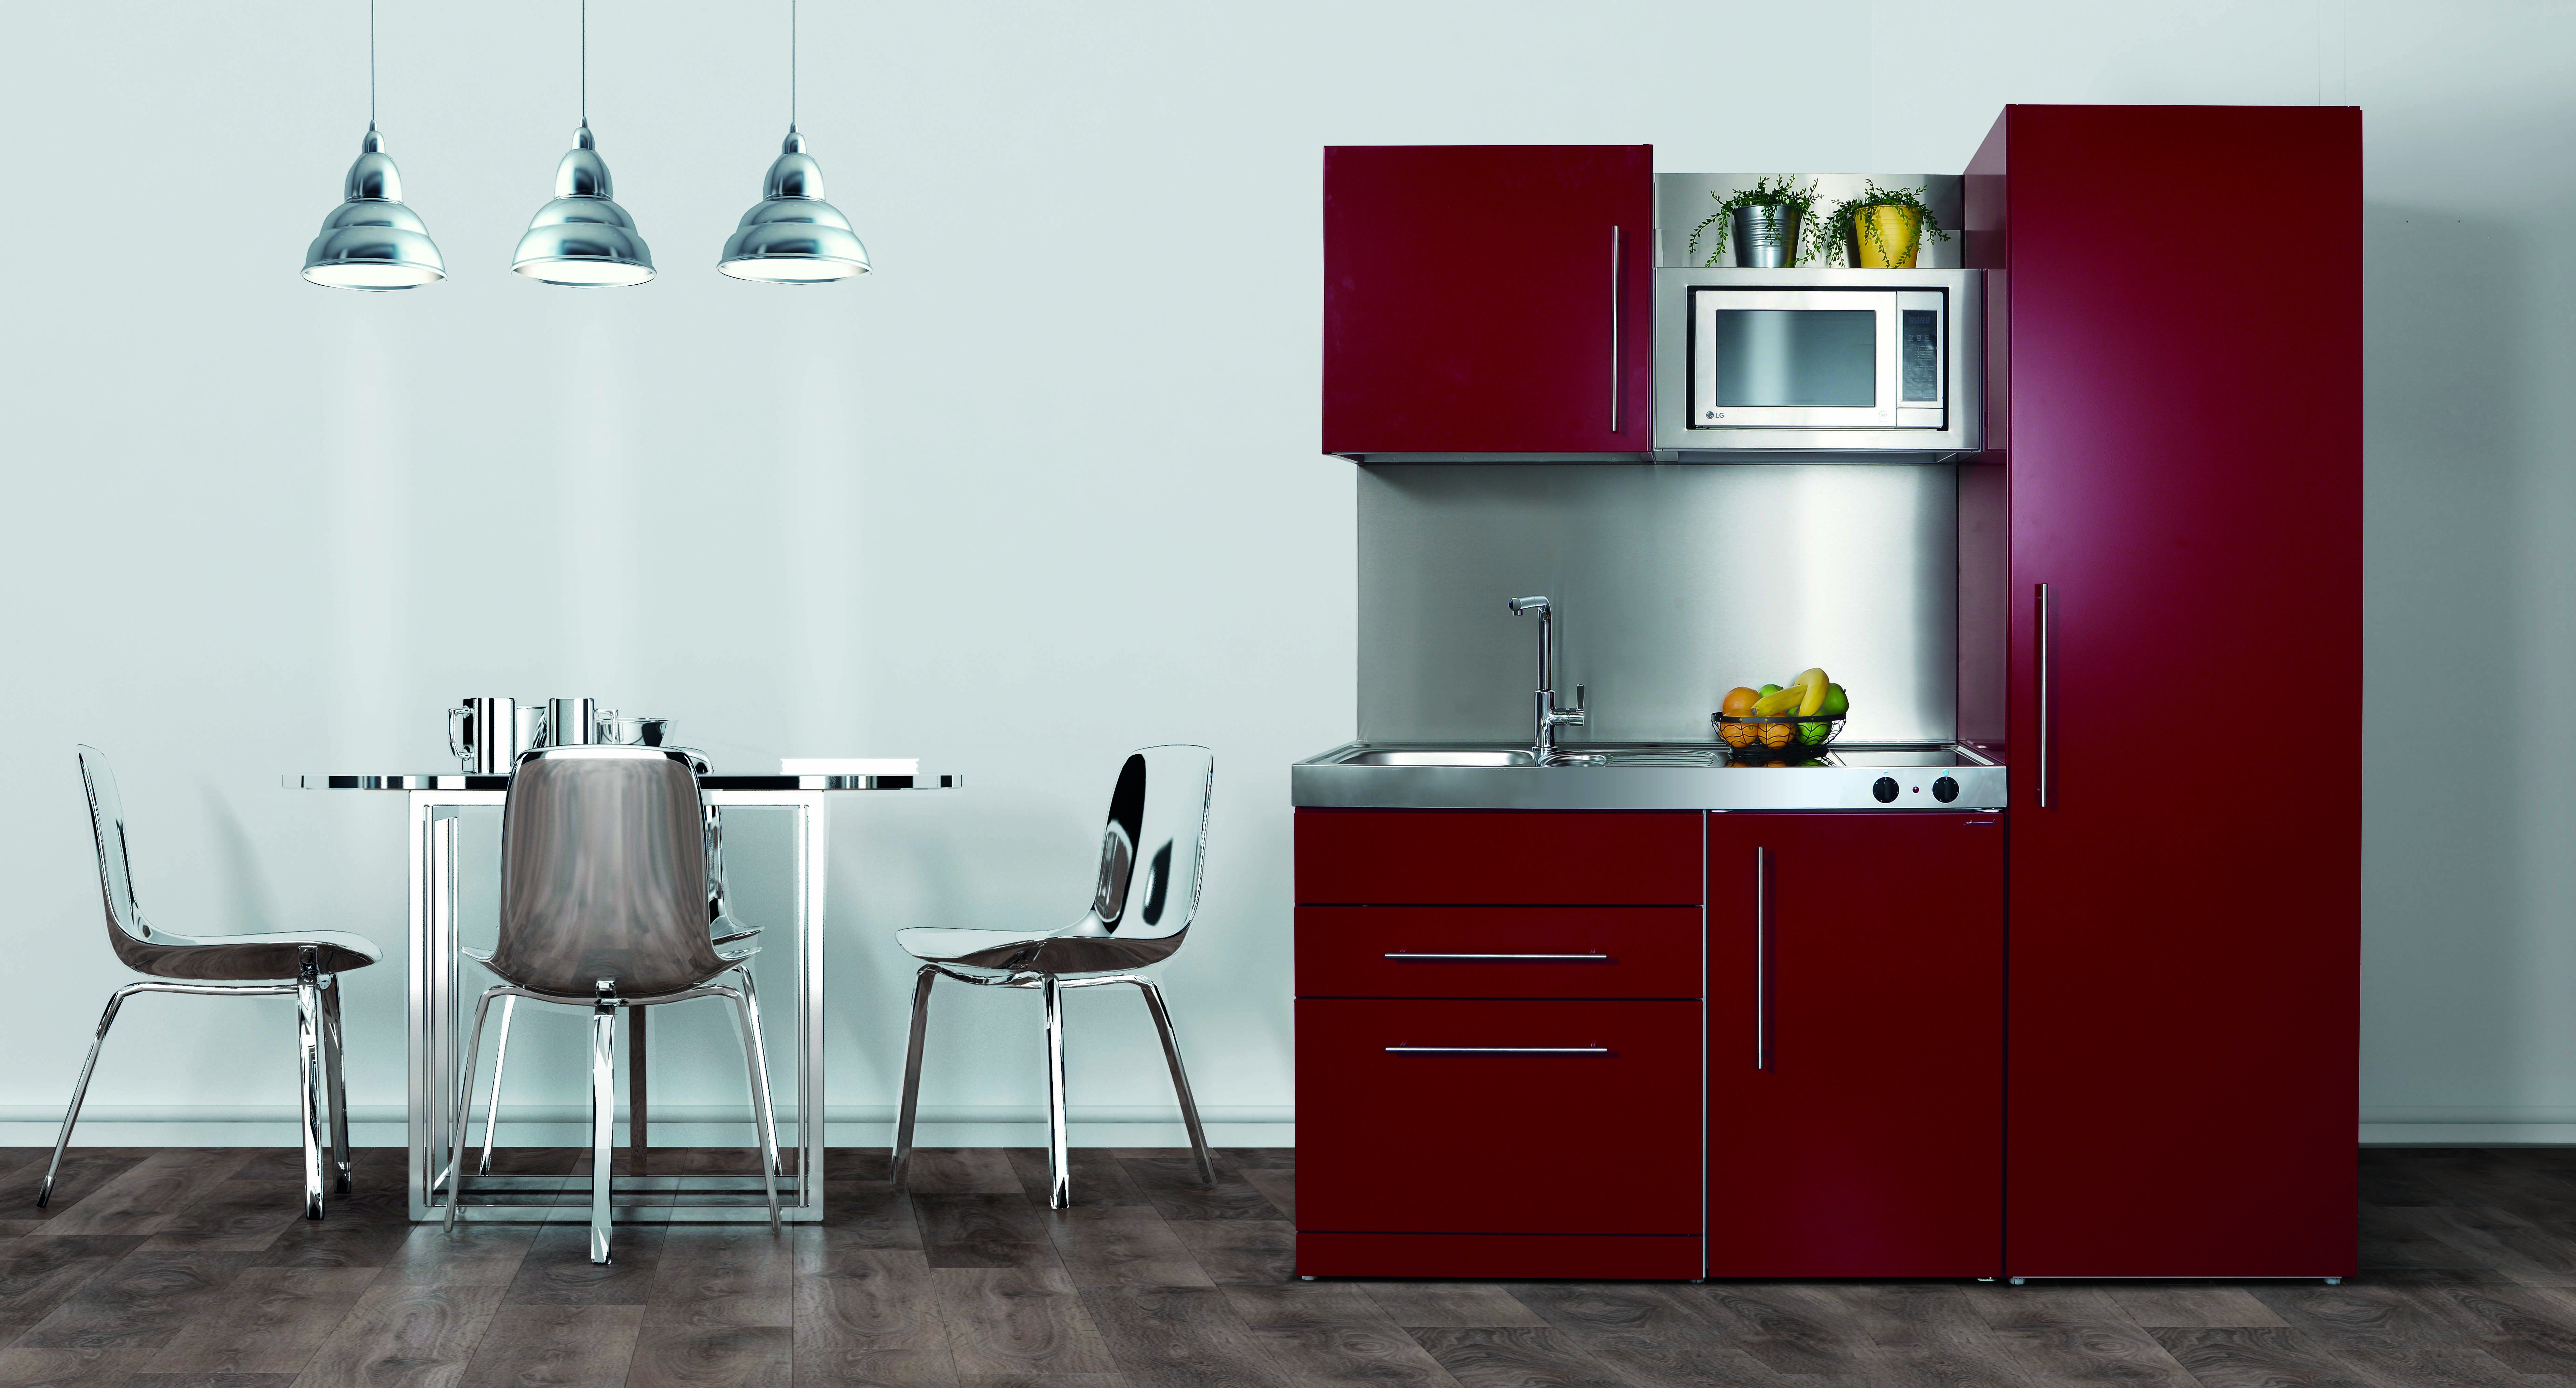 frank zimmerlin freiburg mini k chen pantry k chen. Black Bedroom Furniture Sets. Home Design Ideas